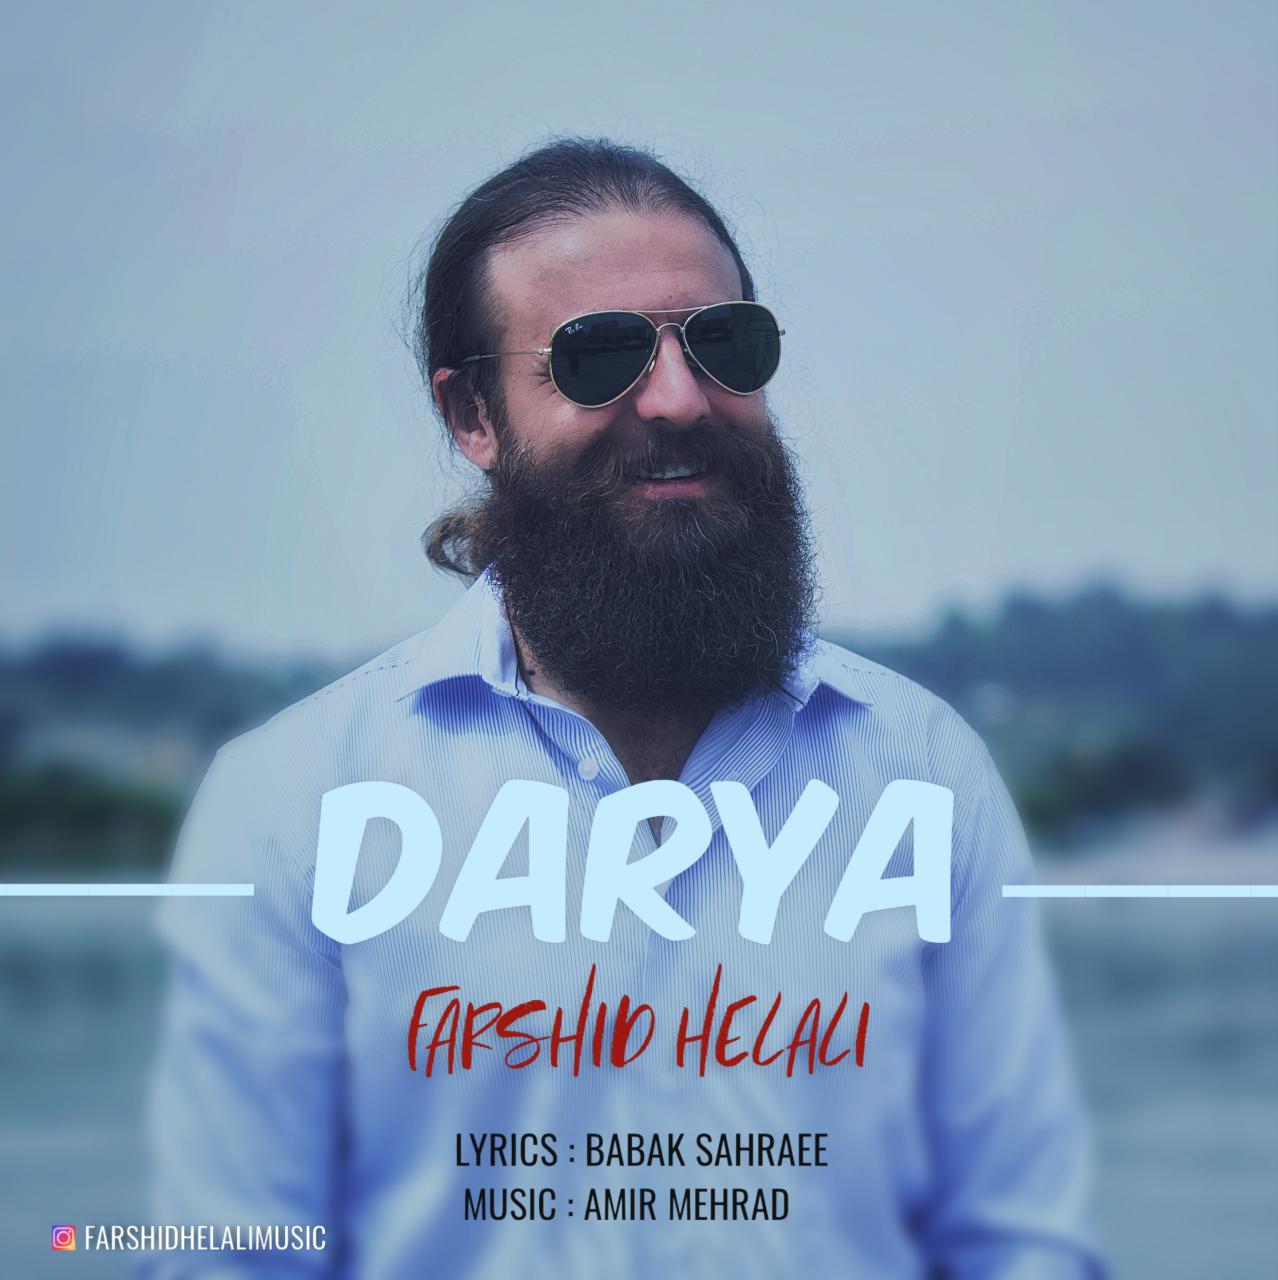 Farshid Helali – Darya